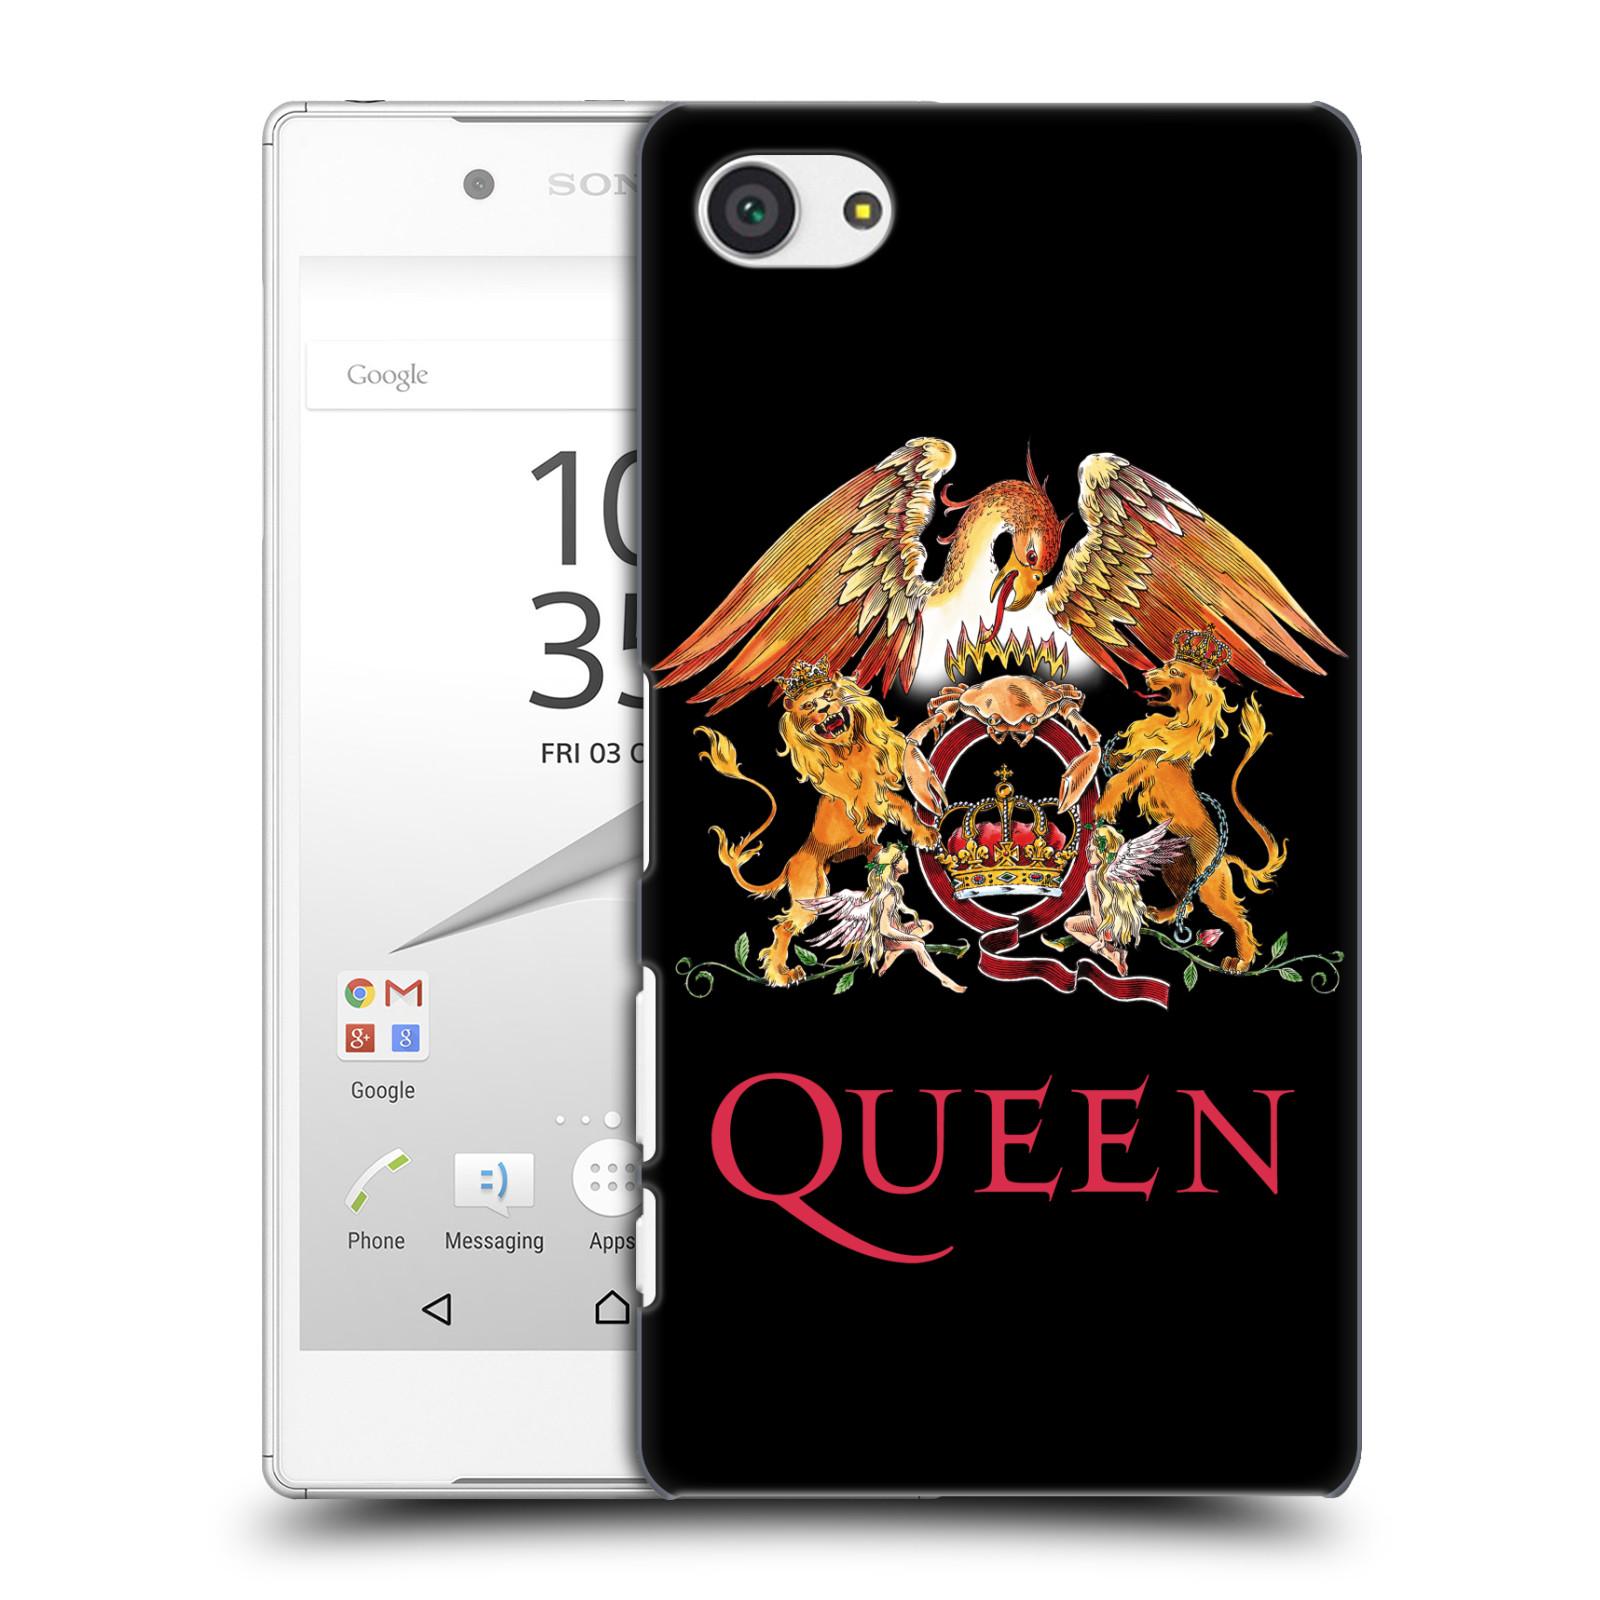 Plastové pouzdro na mobil Sony Xperia Z5 Compact HEAD CASE Queen - Logo